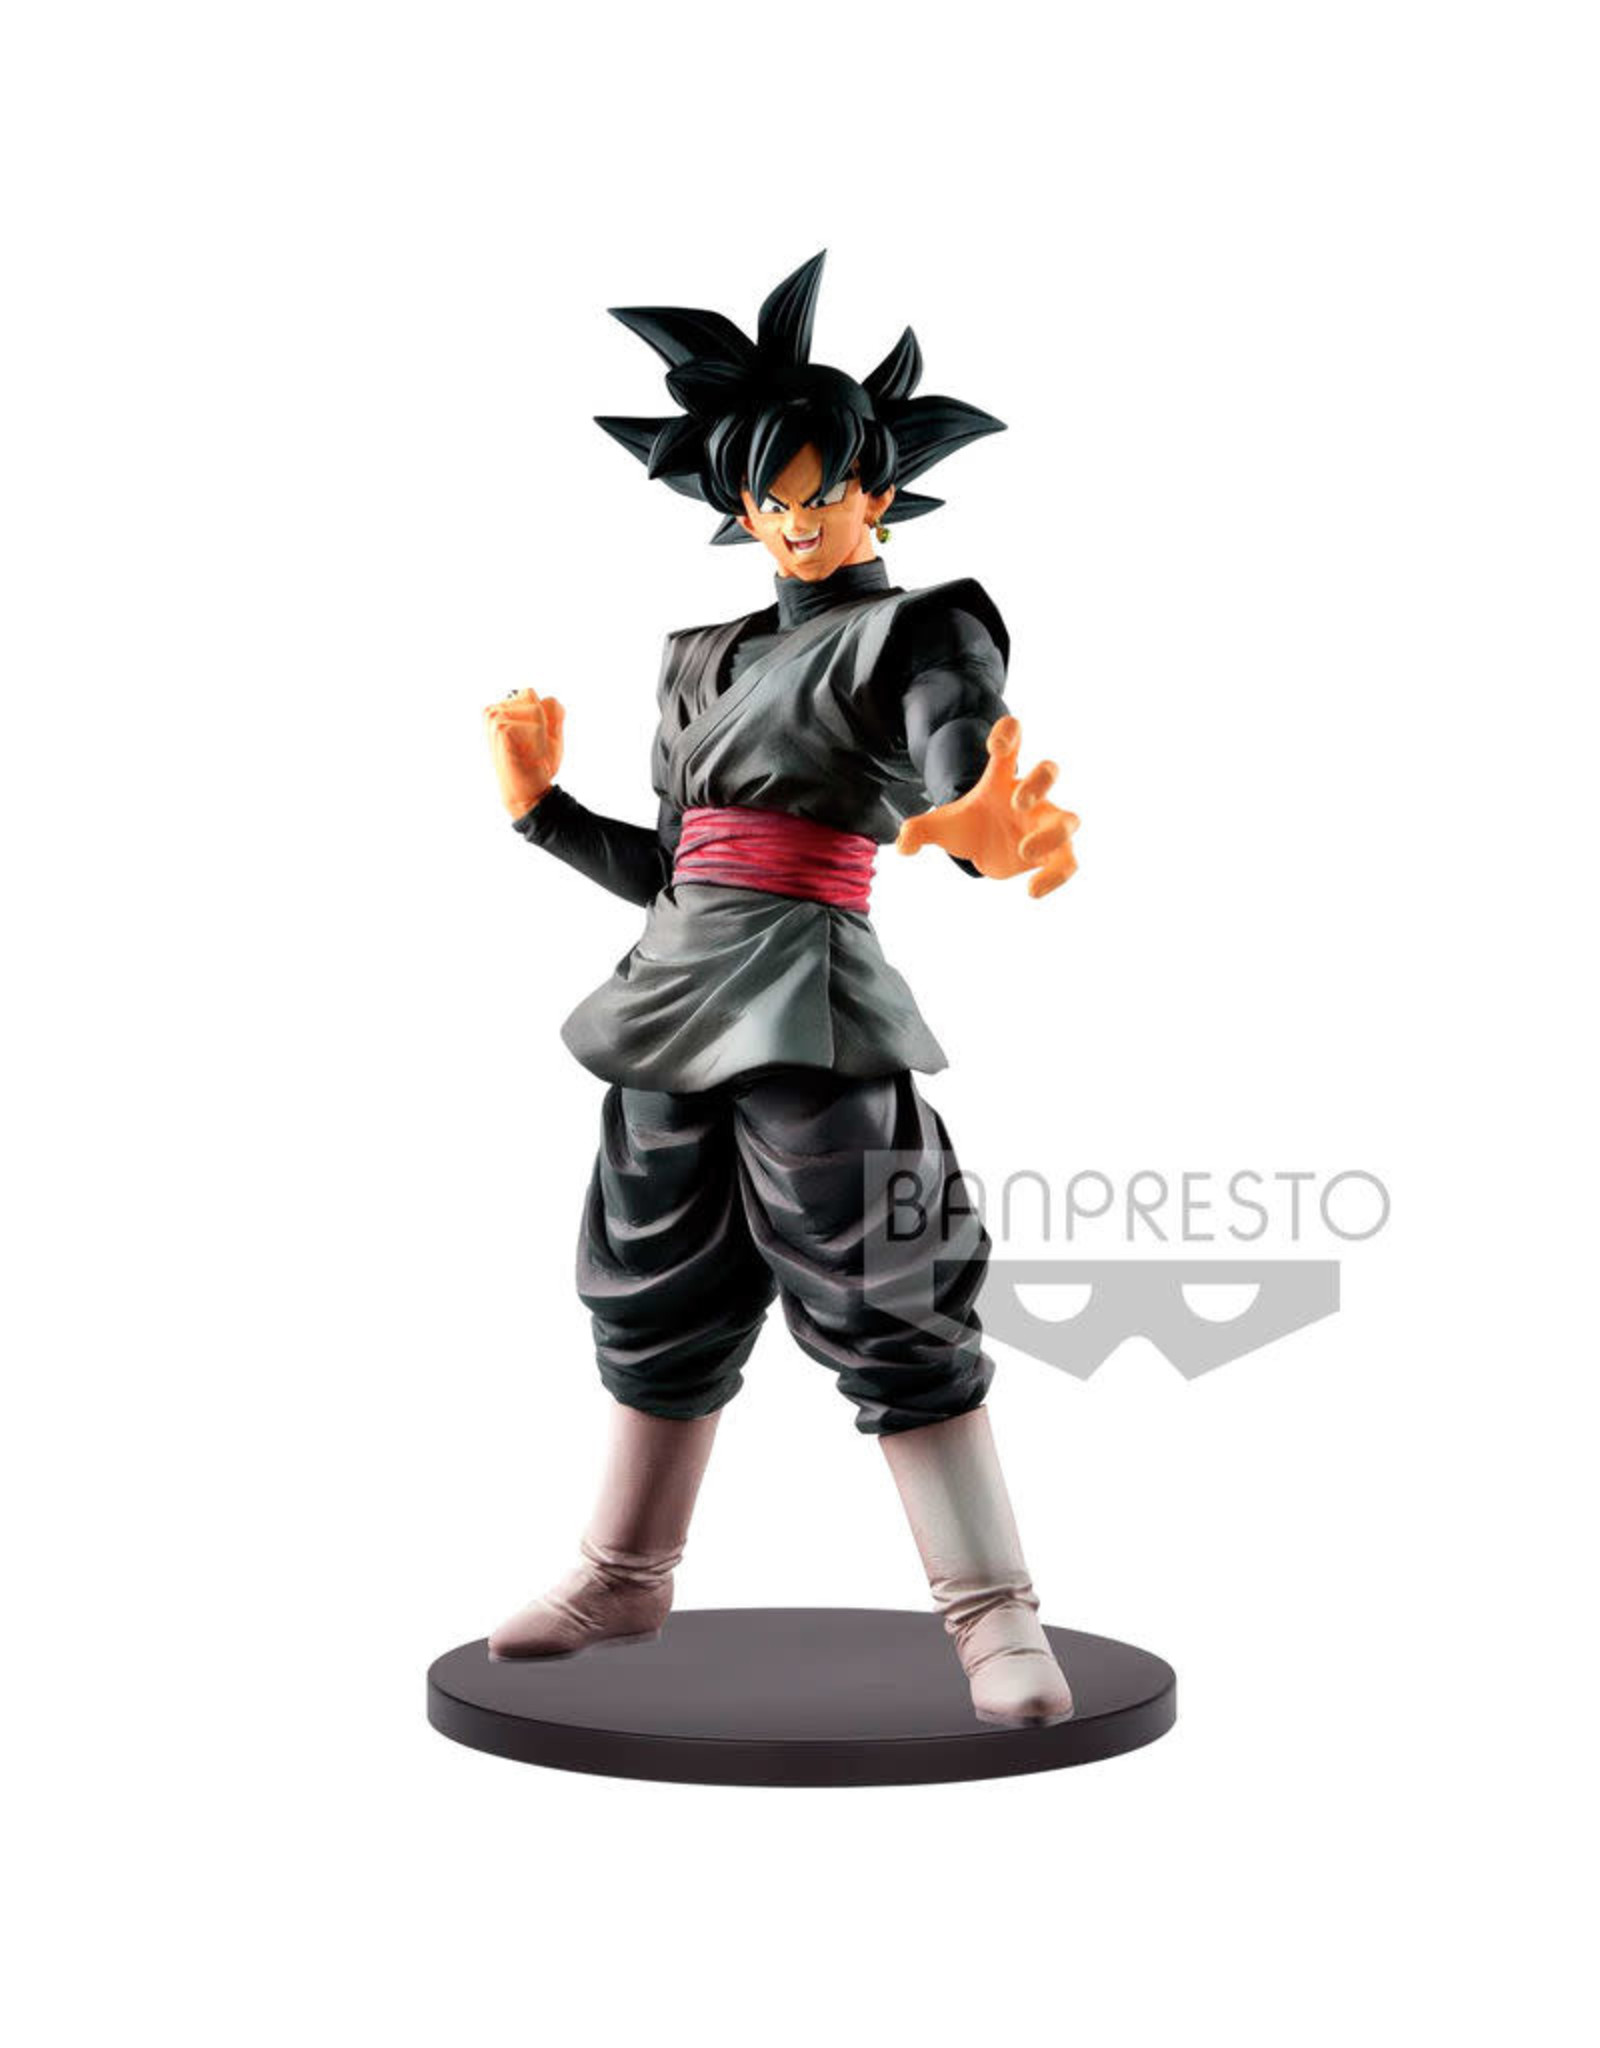 Banpresto DRAGON BALL Legends Collab Figure 23cm - Goku Black